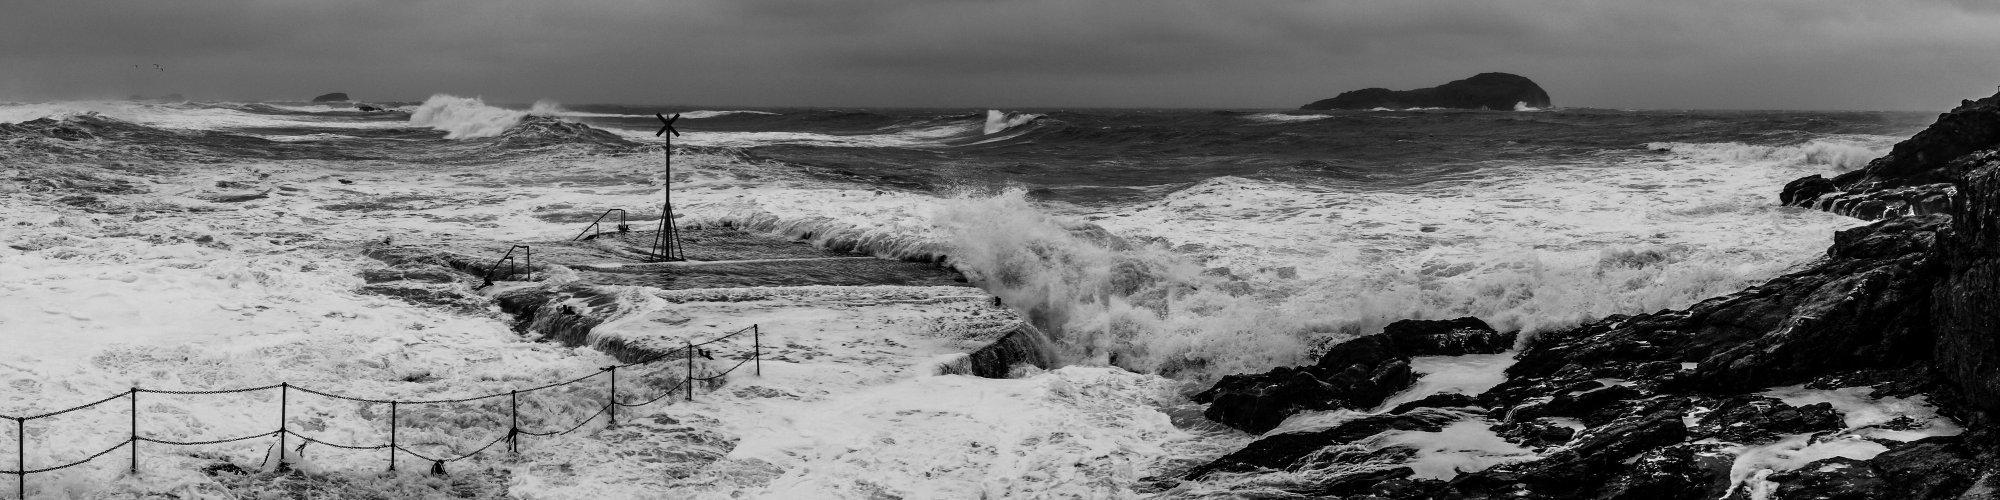 Stormy Seas, North Berwick, East Lothian